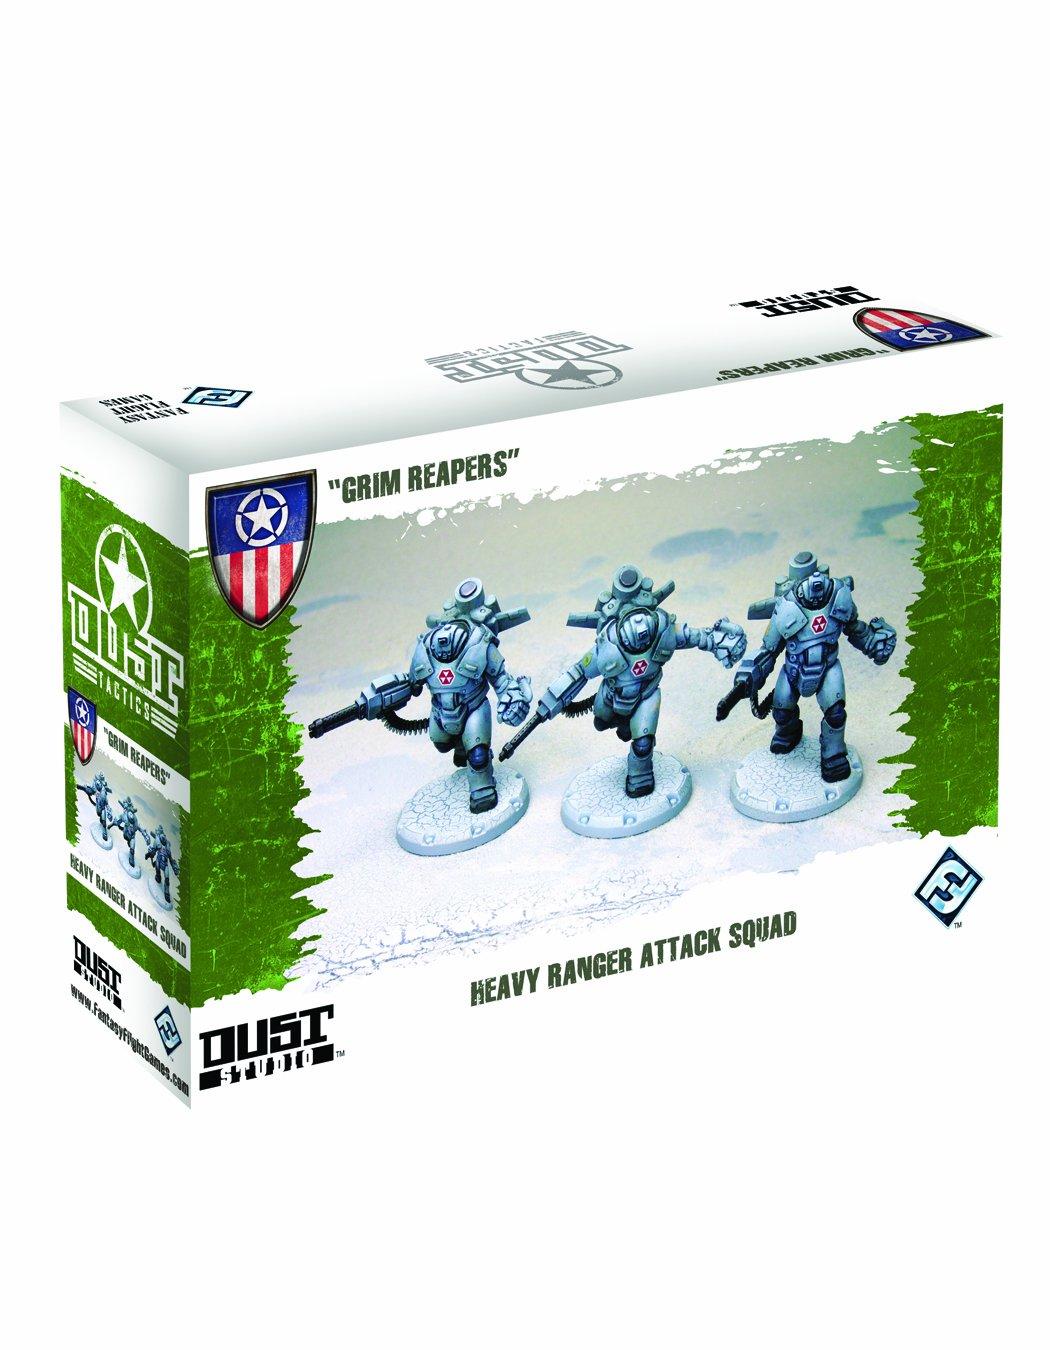 Dust Tactics Heavy Ranger Attack Squad: Grim Reapers